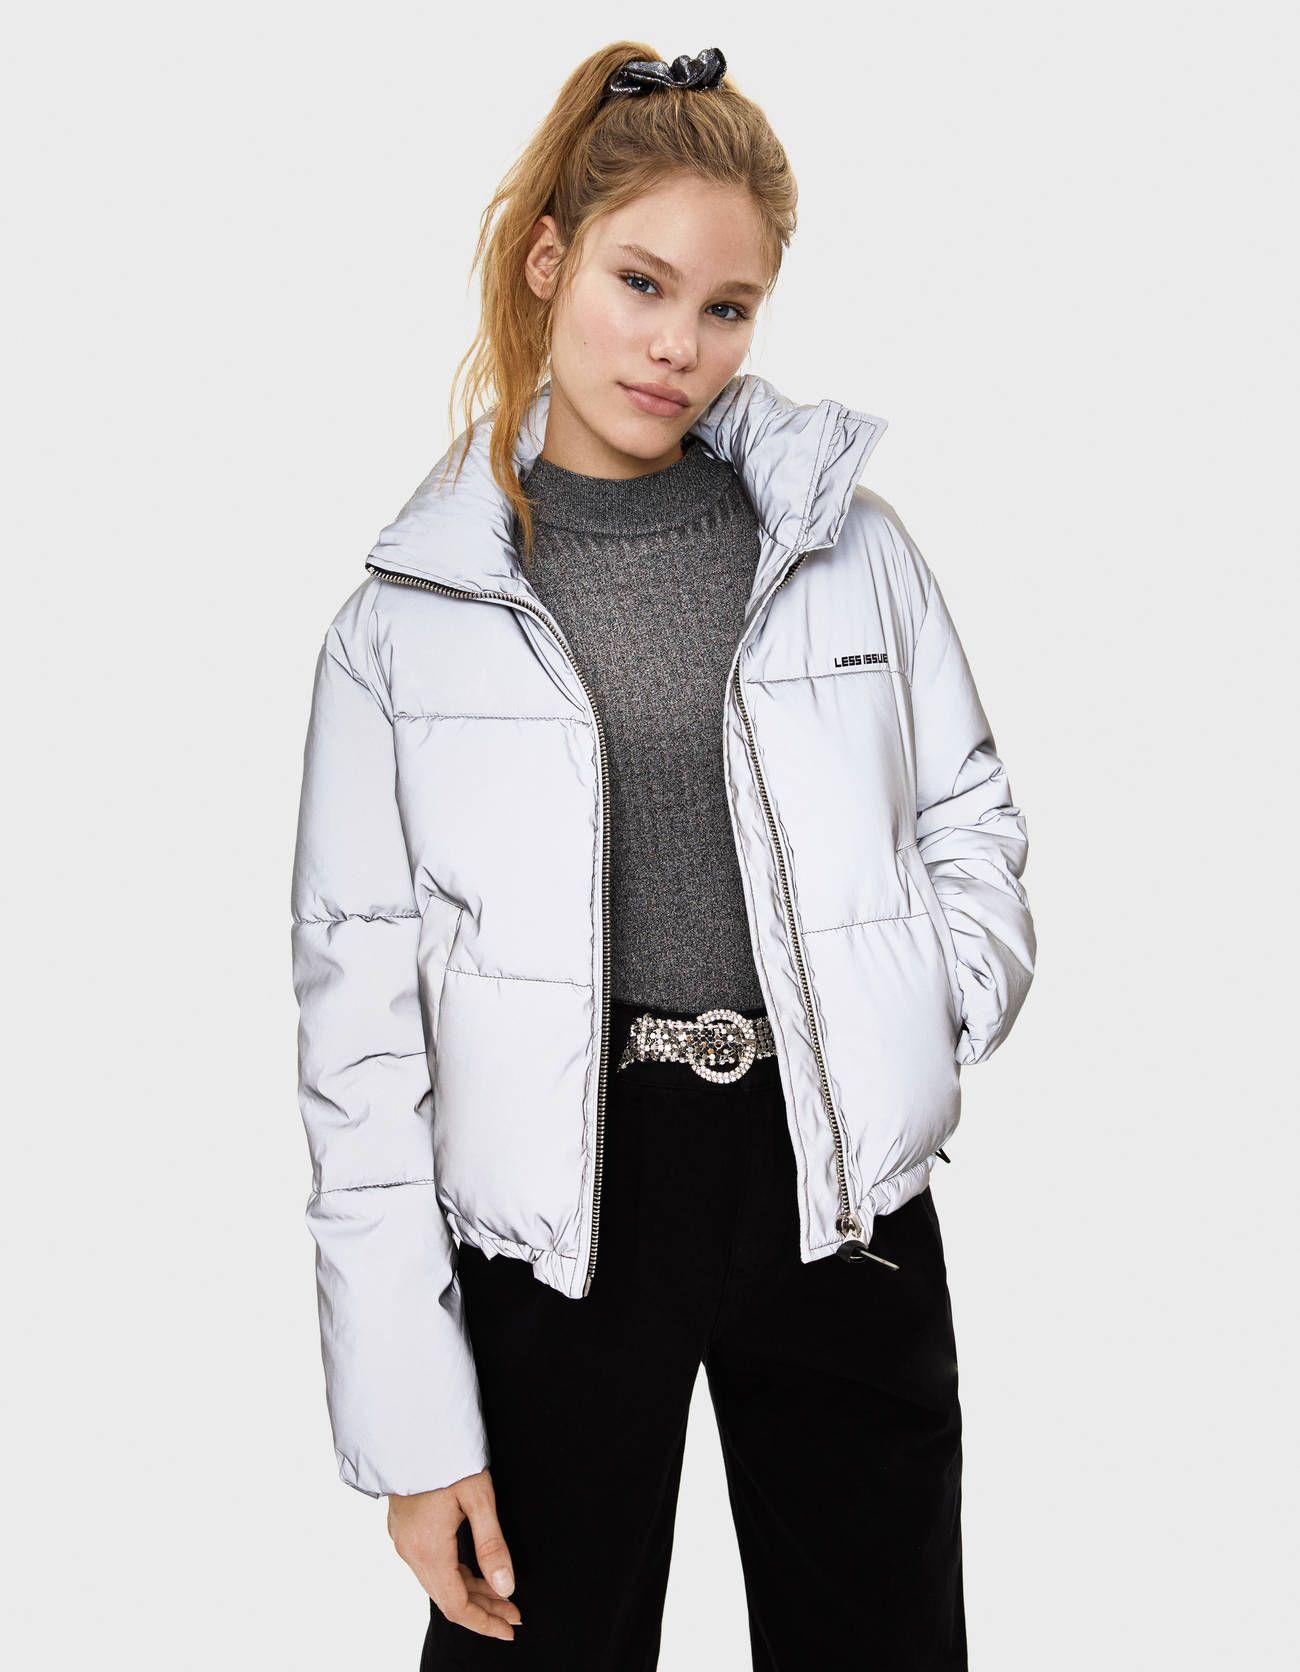 Bershka Reflective Puffer Jacket Bershka Bershkacollection New Newin Fashion Clothes Coats Print Tailoring Trend Kadin Ceketleri Kadin Modasi Mont [ 1672 x 1300 Pixel ]